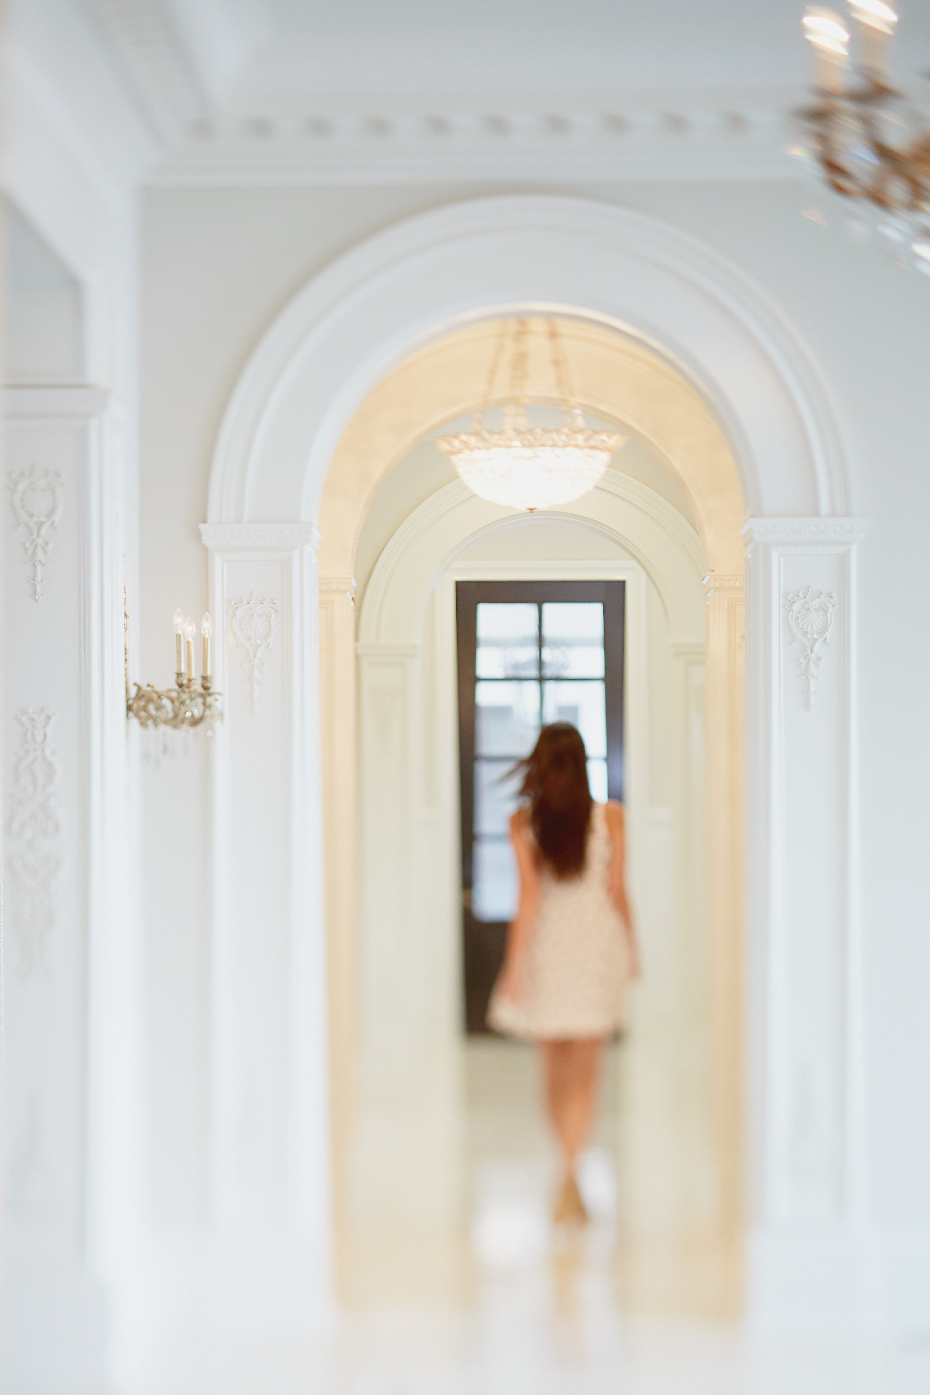 Stacey Van Berkel Photography I Lovely woman walking through archway I White on white I Elegance + glamour I Bernhardt Furniture